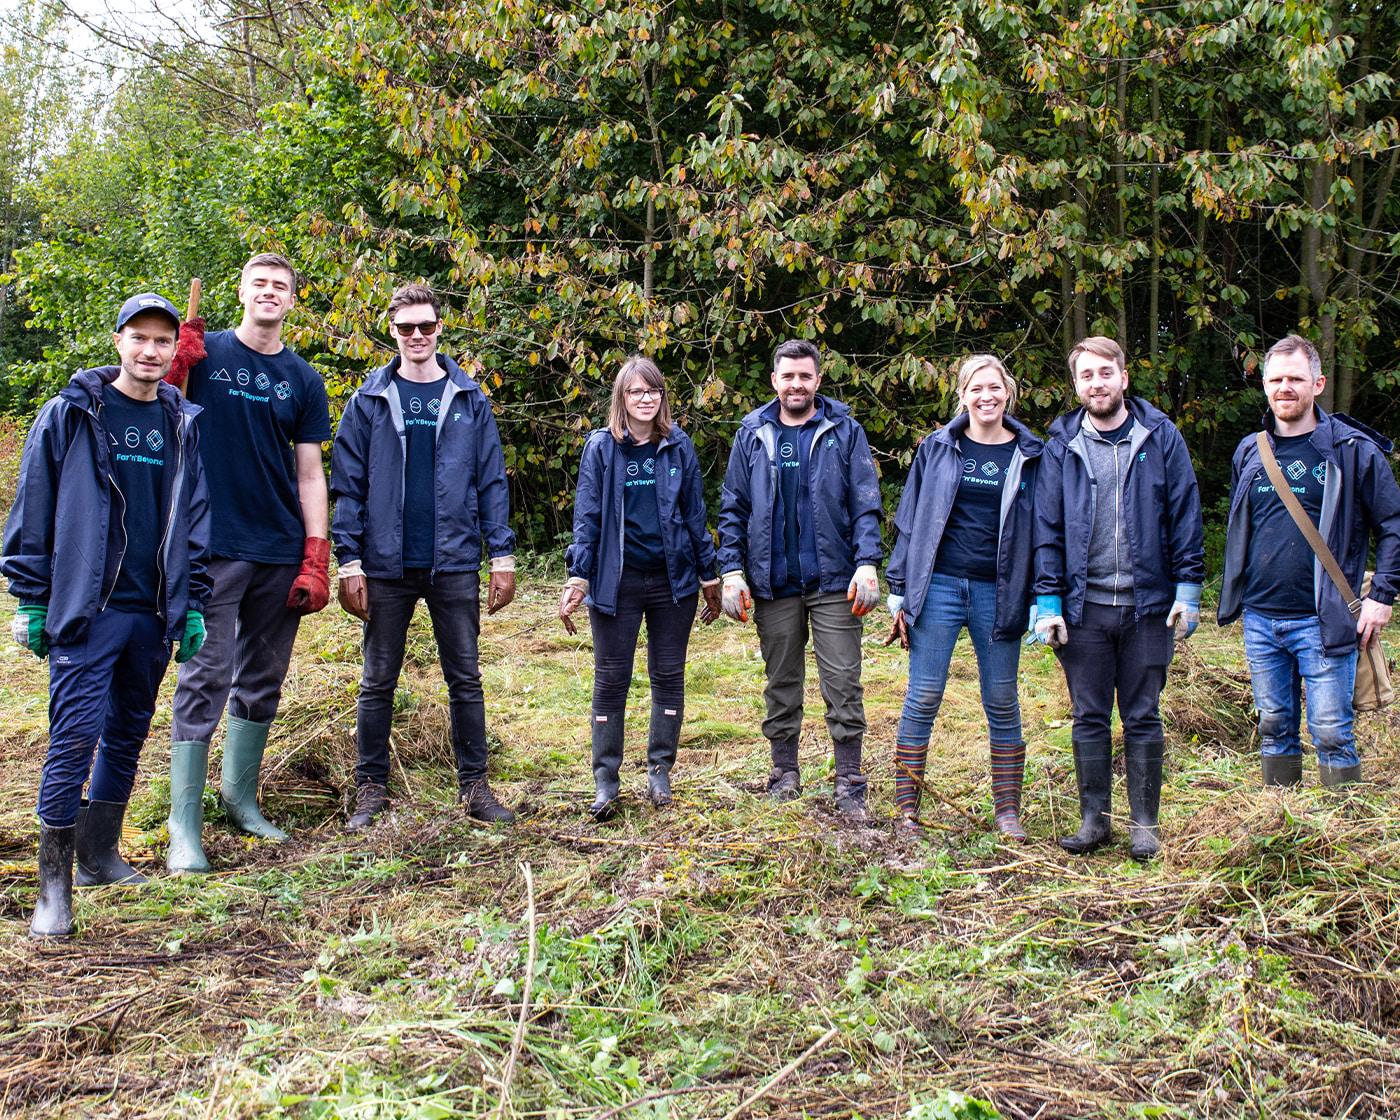 Waterproof Jackets - Team Corporate Day